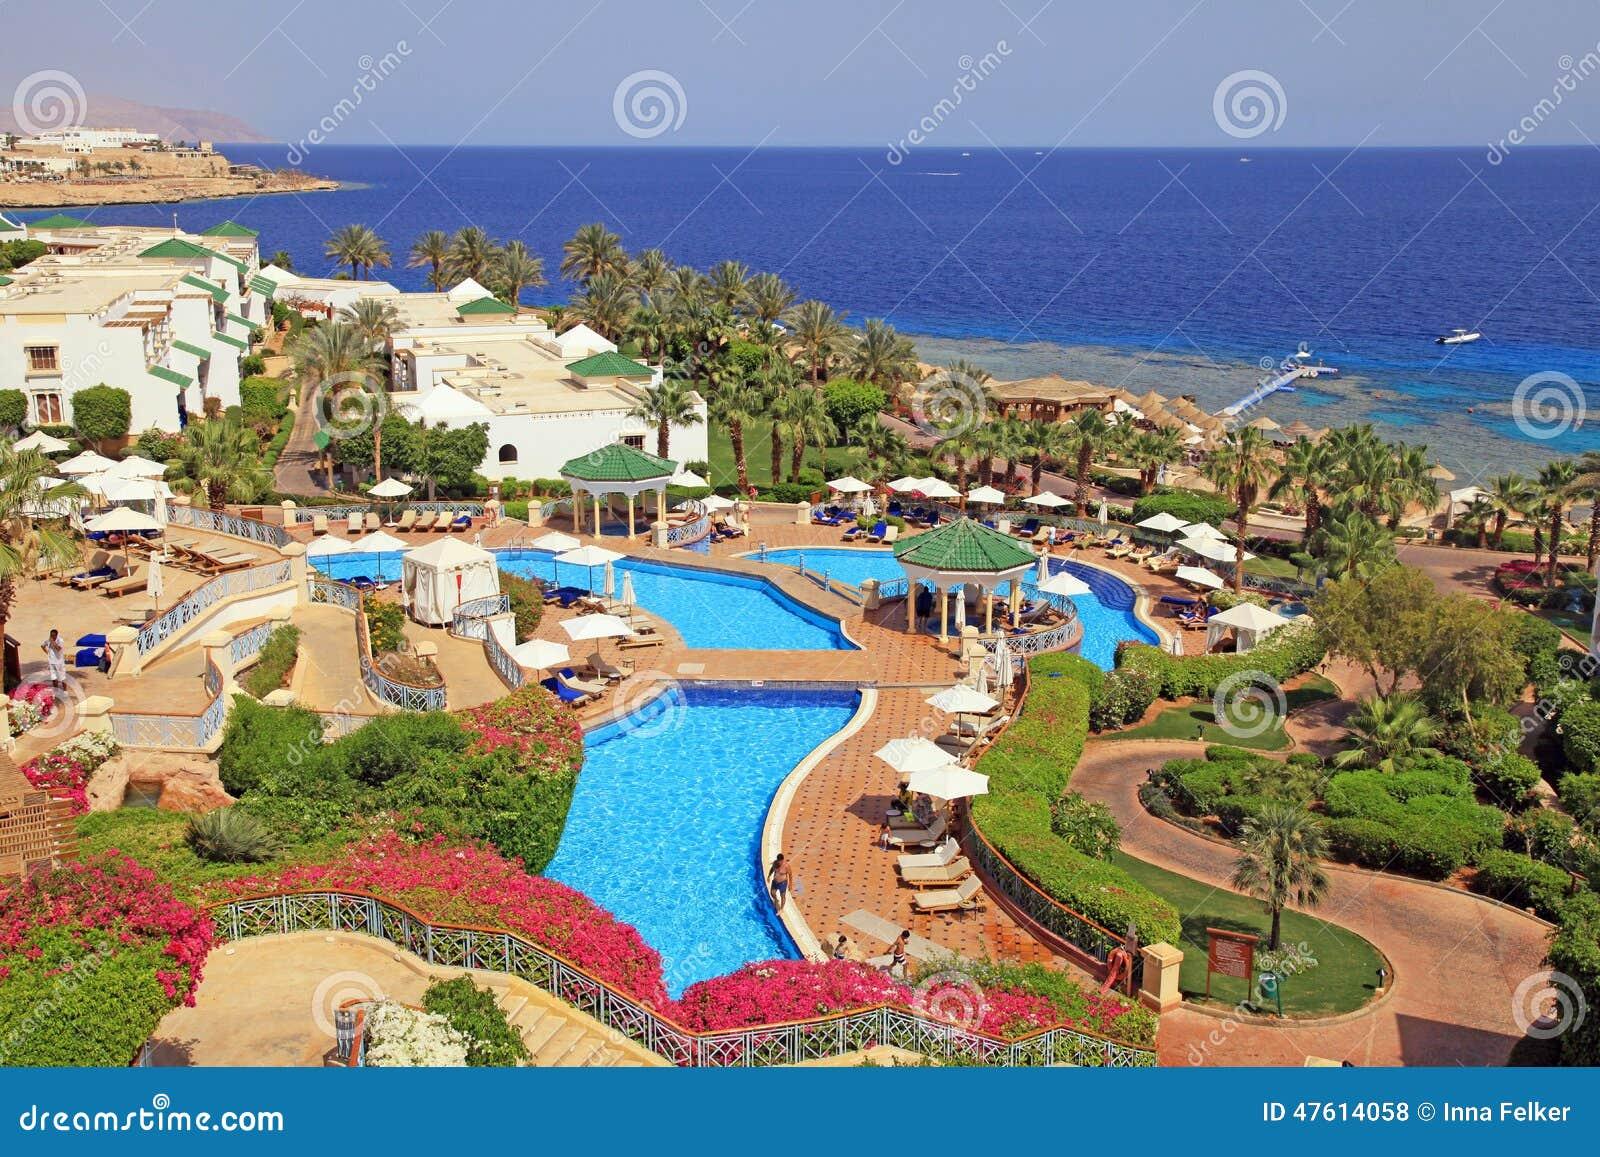 Tropical luxury resort hotel, Sharm el Sheikh, Egypt.